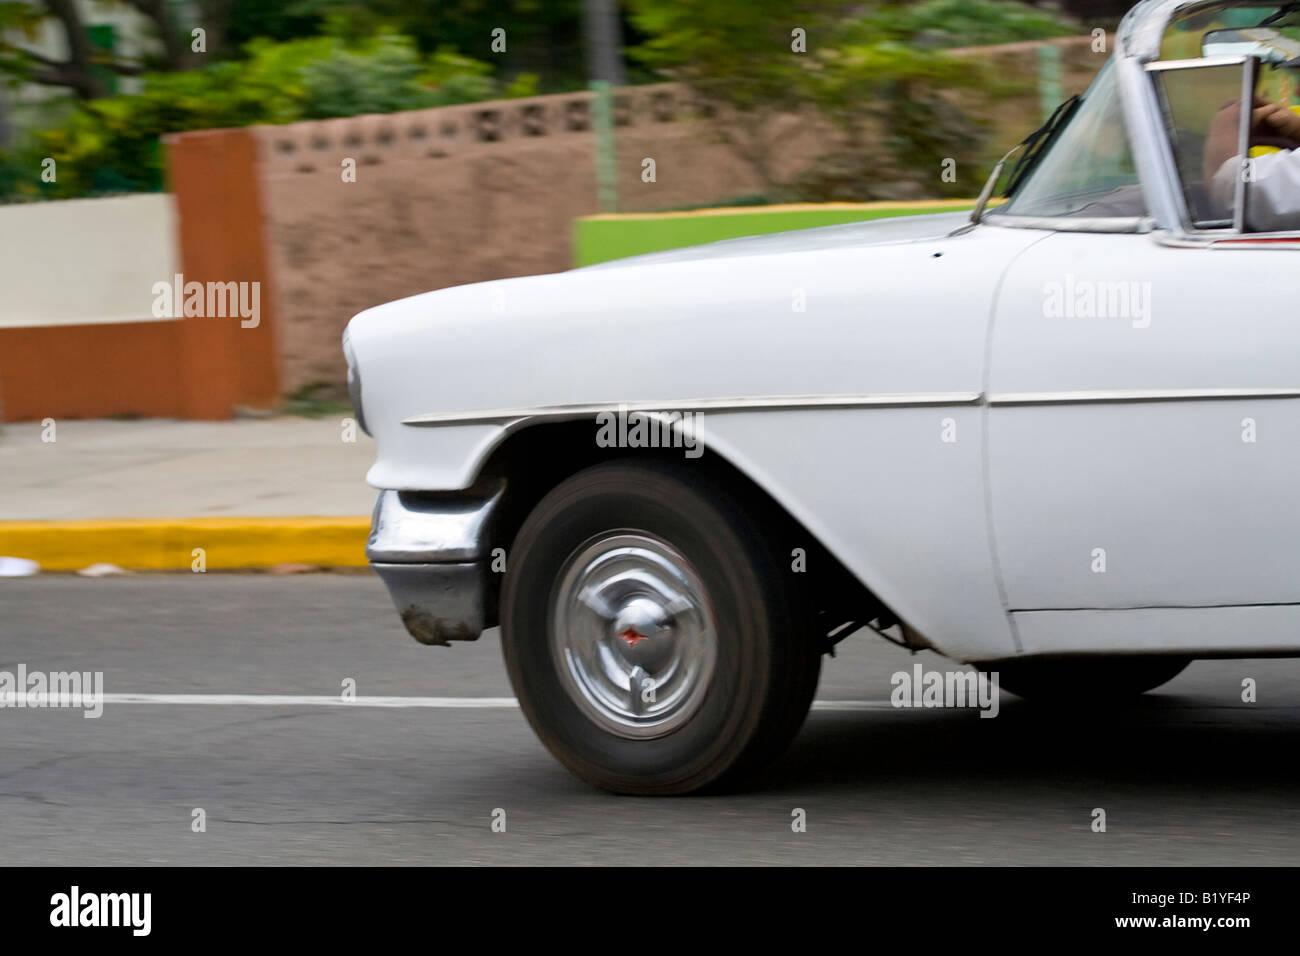 Car Design Blue Print Stockfotos & Car Design Blue Print Bilder - Alamy